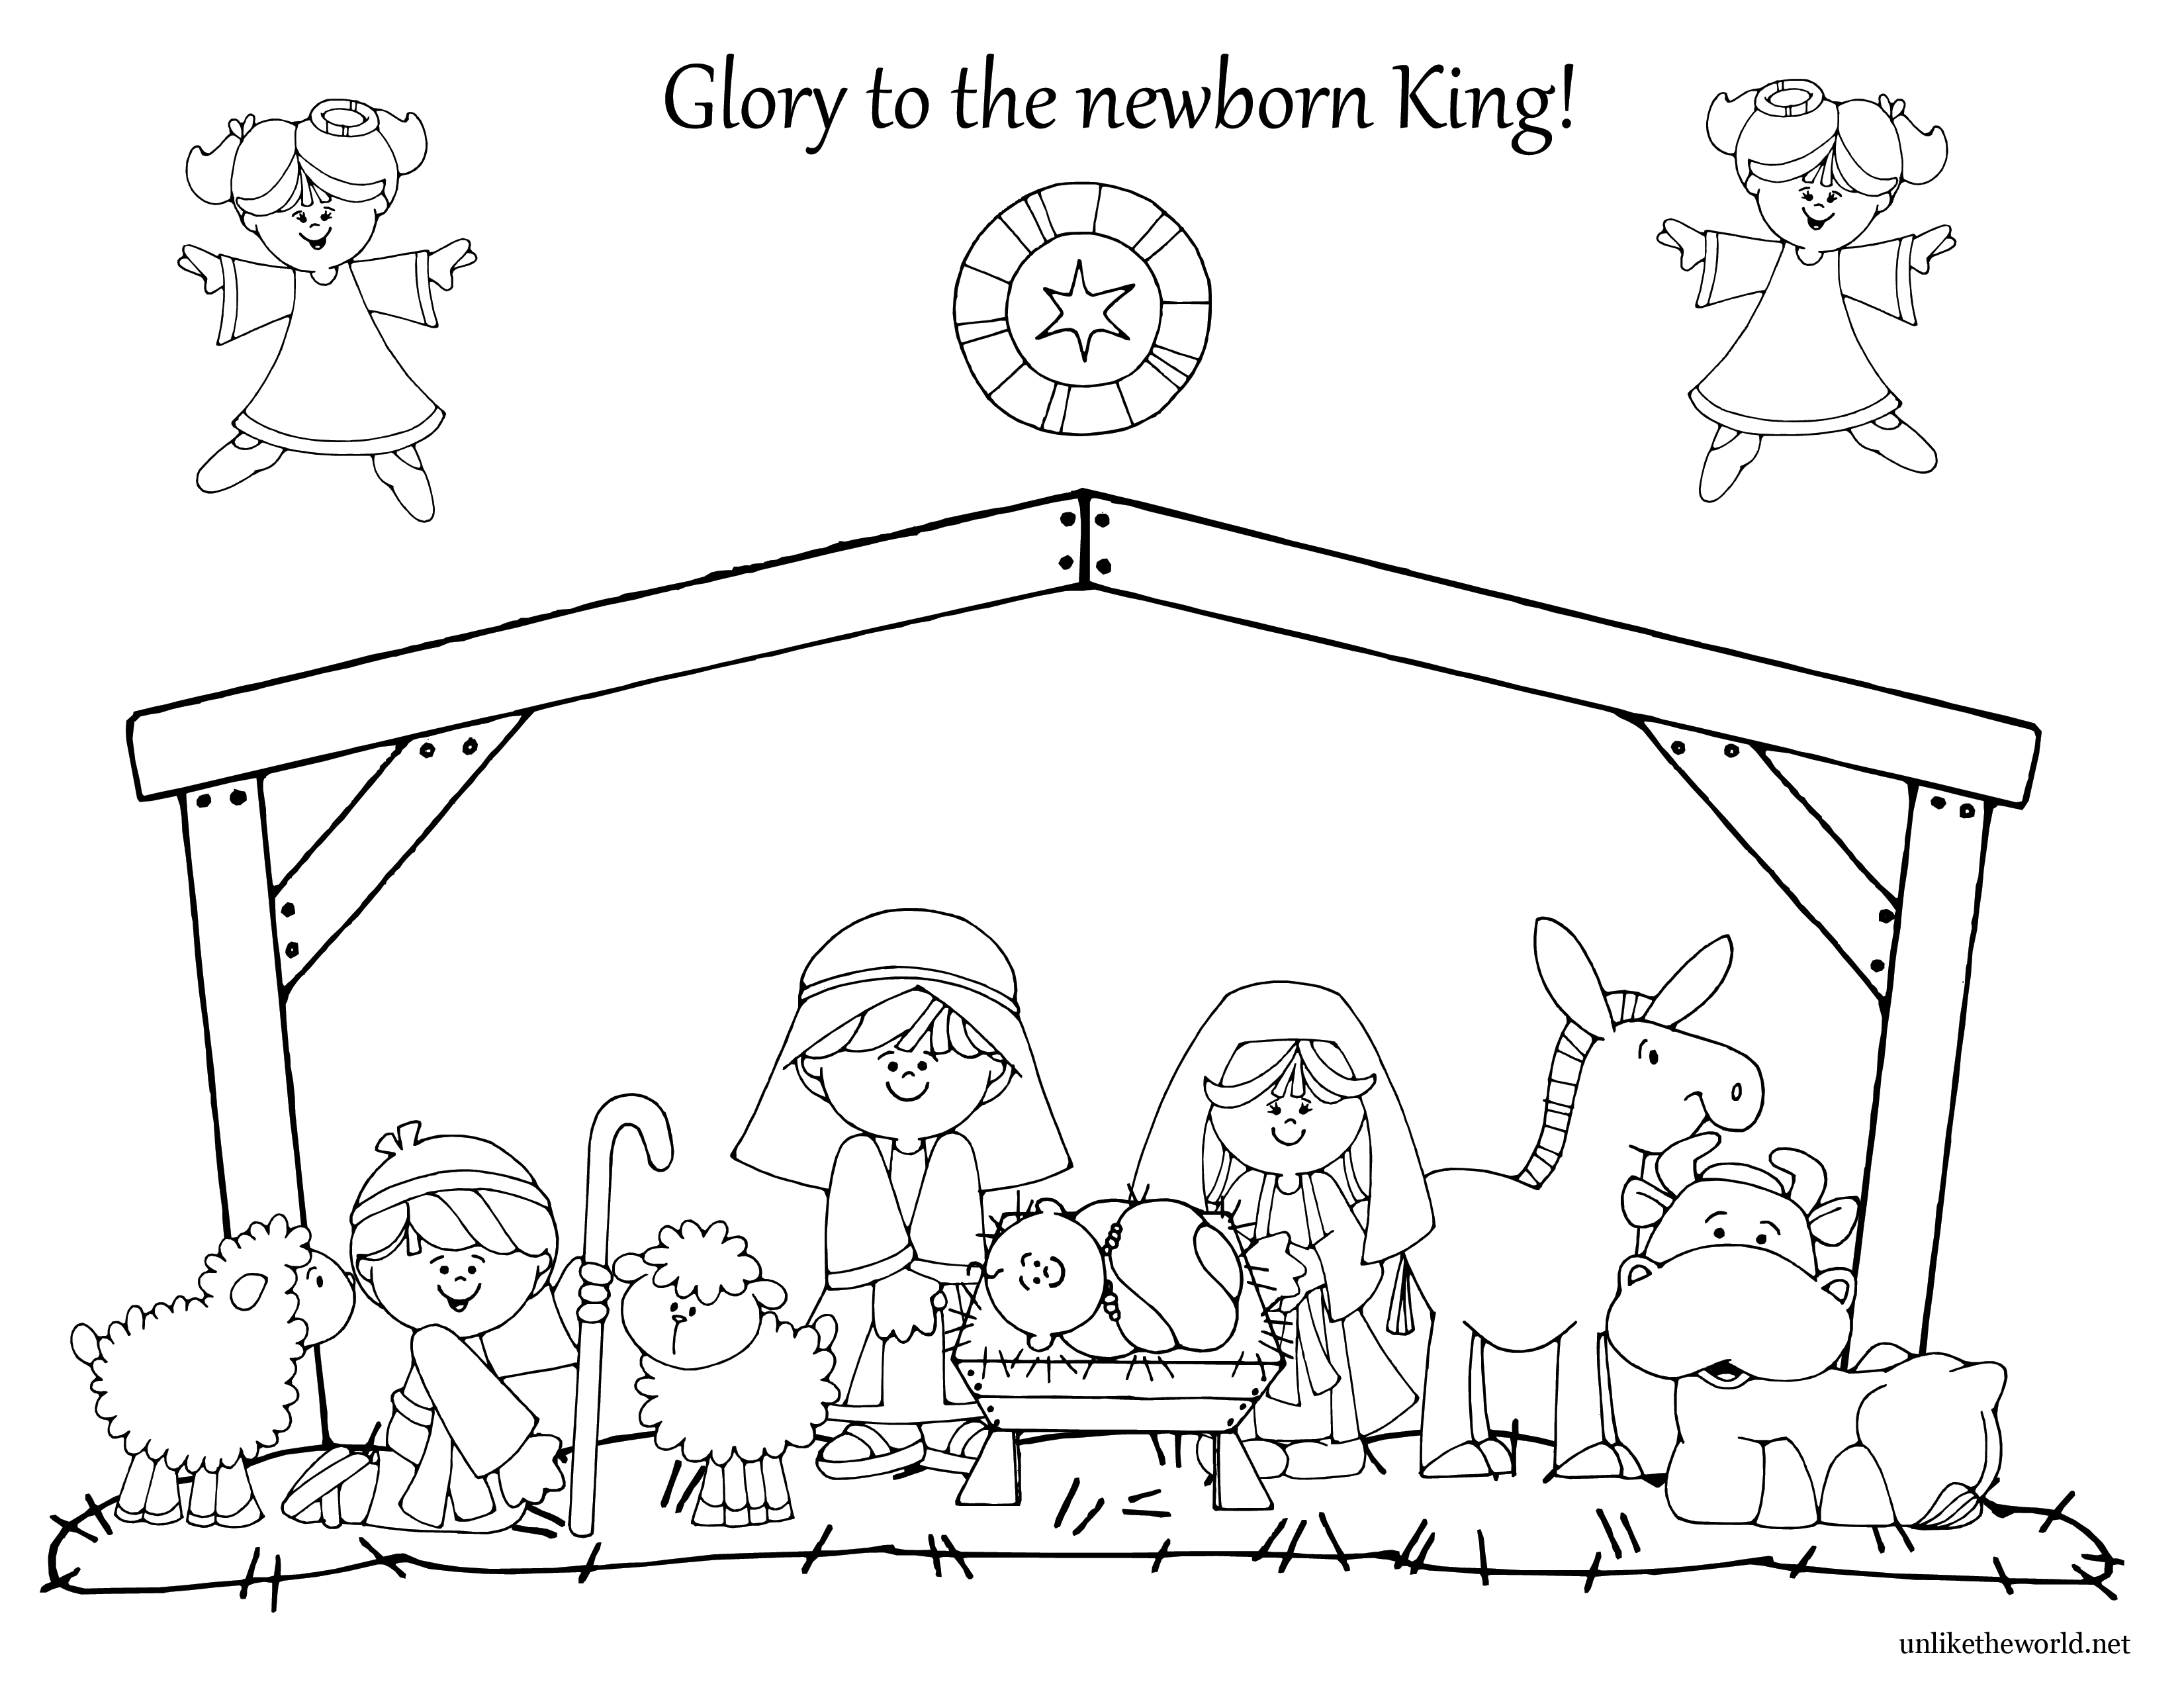 NativityColoringutw.png 3,300×2,550 pixels Nativity